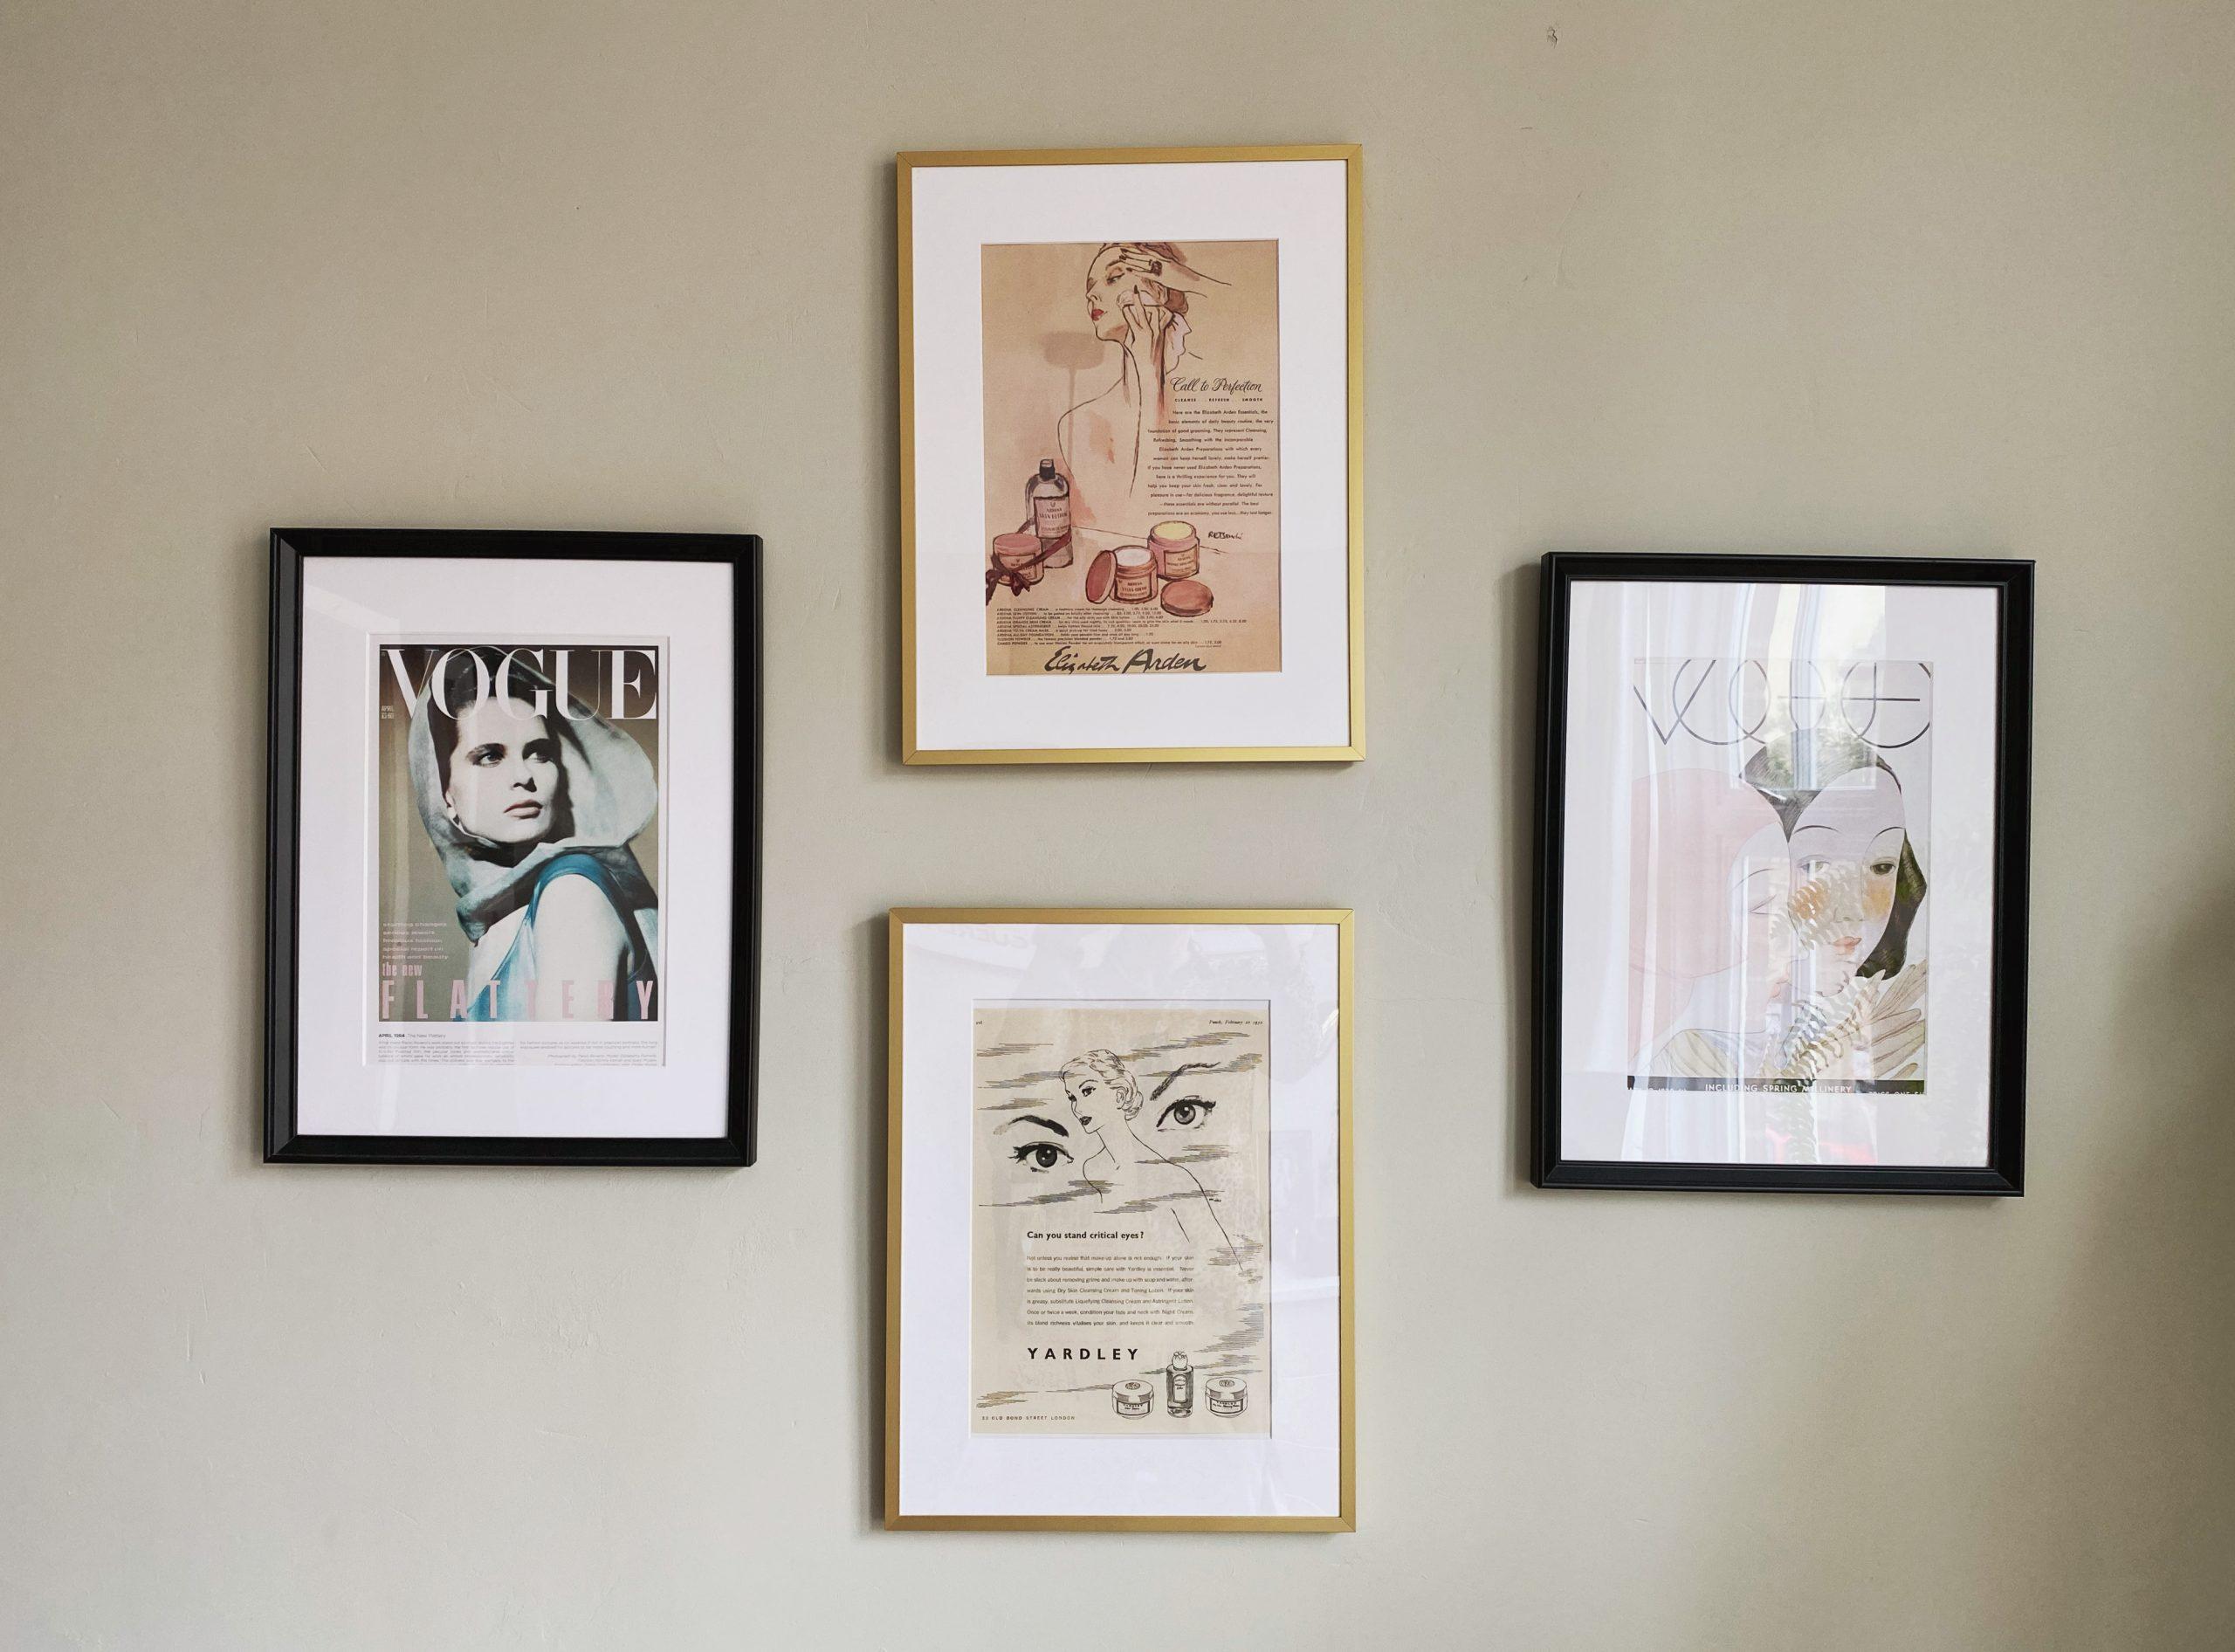 vintage vogue prints and vintage makeup adverts